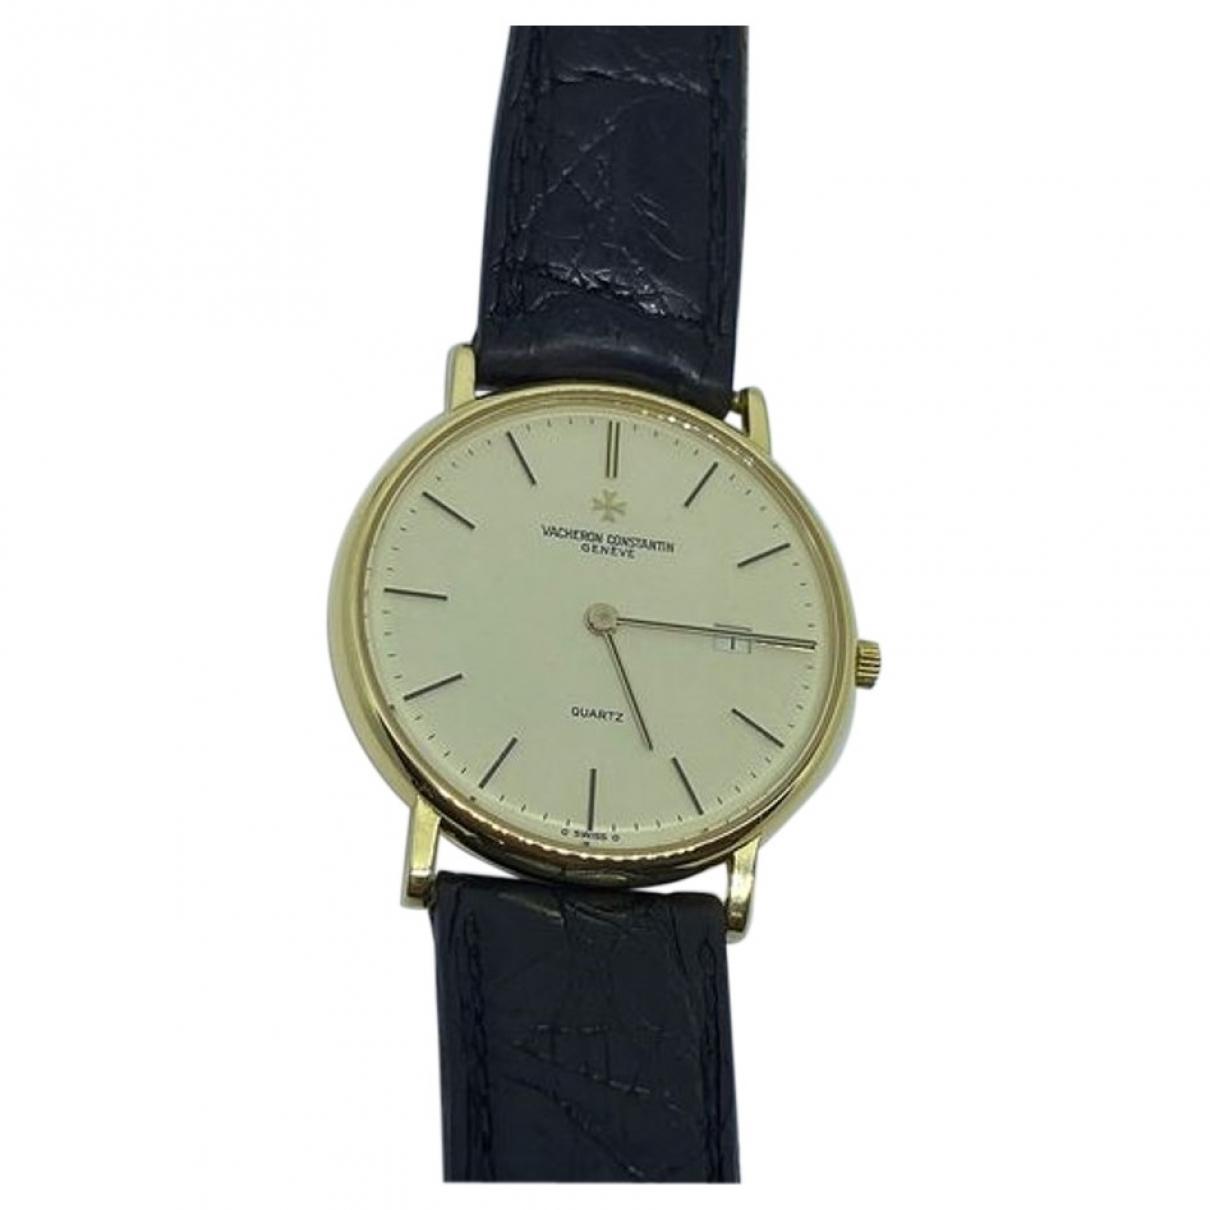 Relojes Patrimony de Oro amarillo Vacheron Constantin